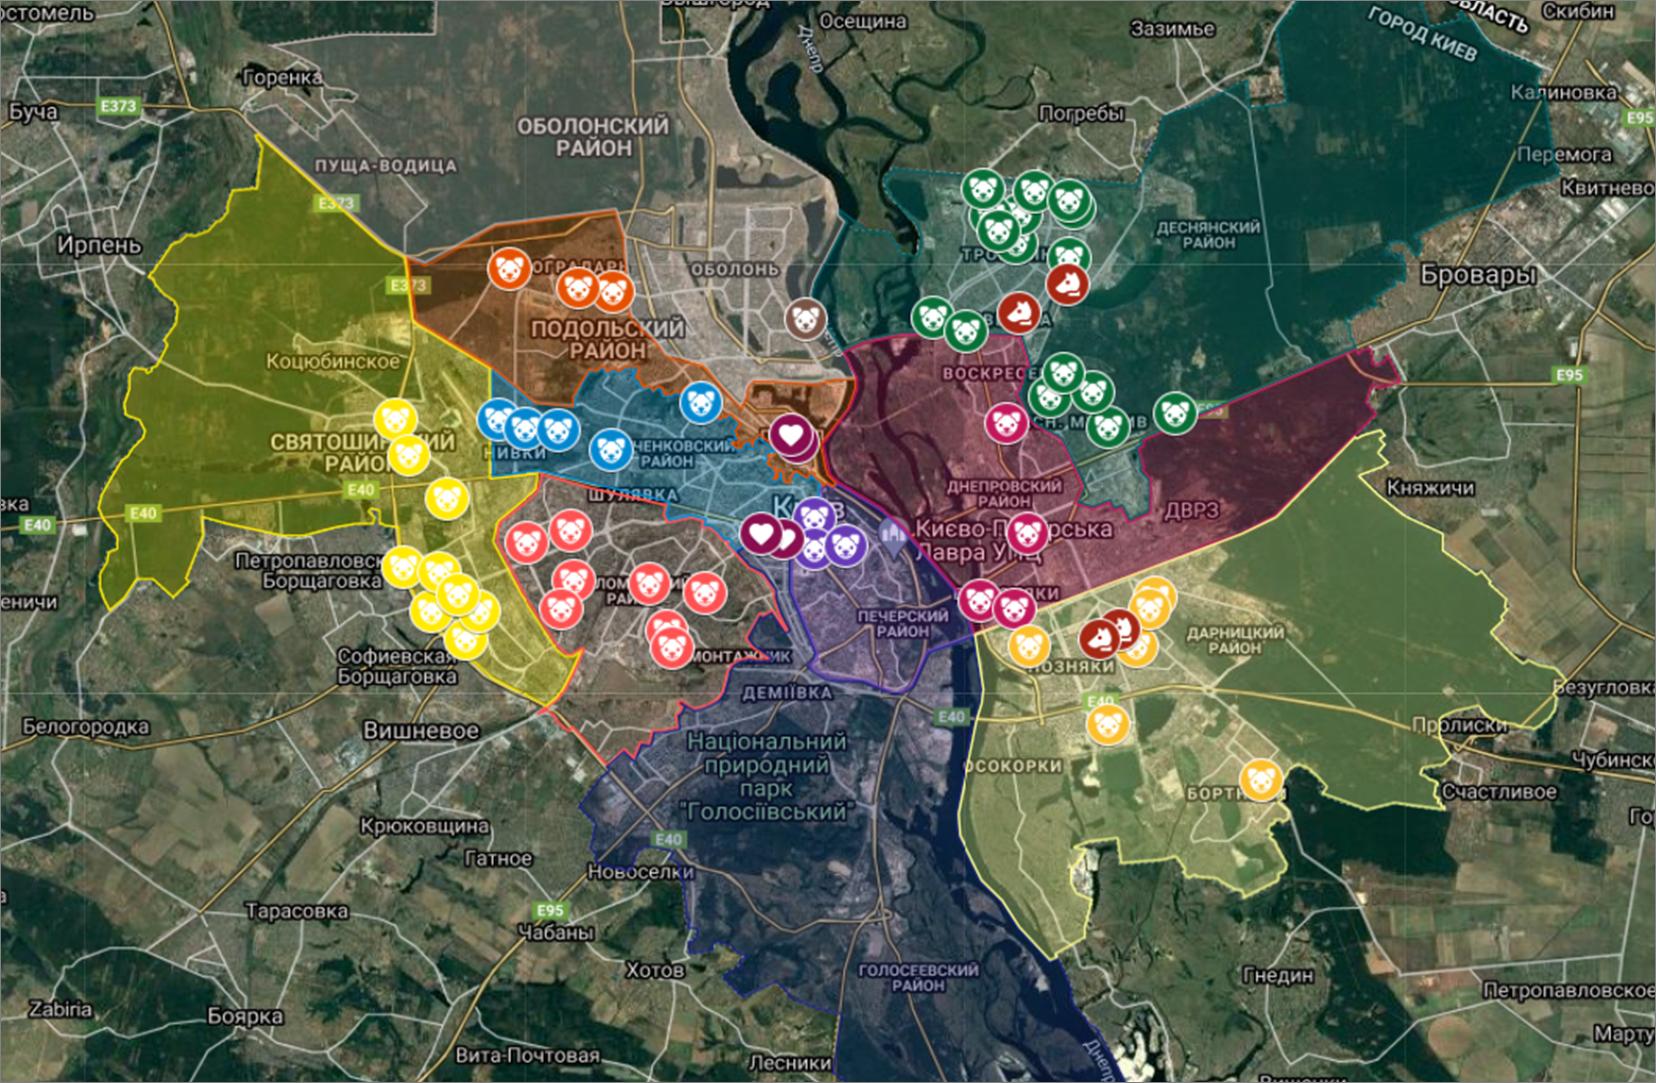 Карта для выгула собак. Фото: скрин с сайта http://kyivibes.org/dogs